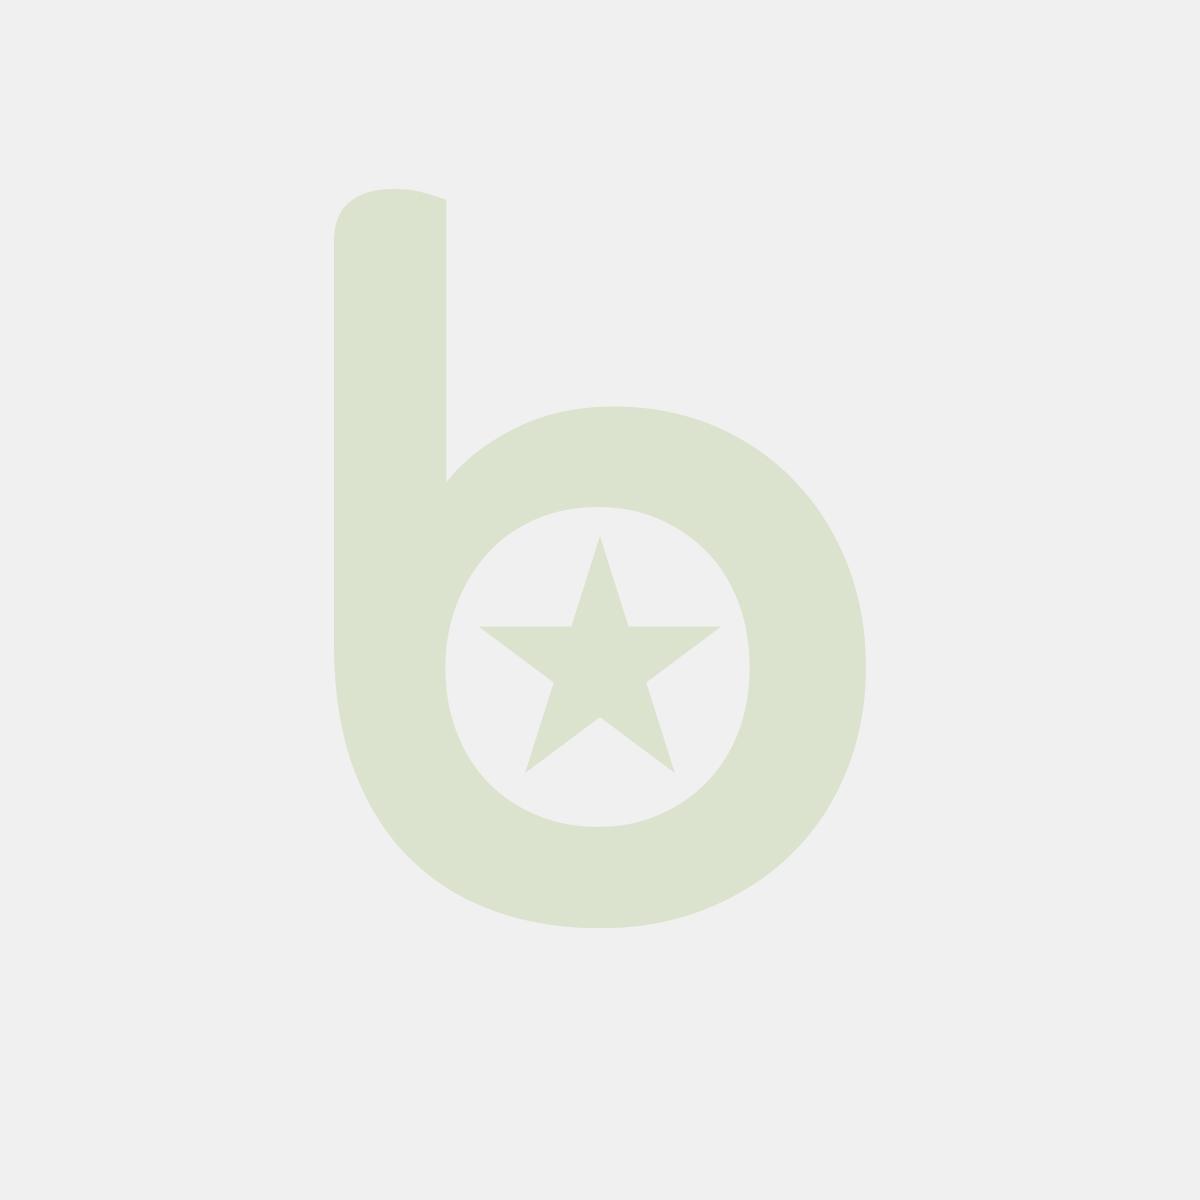 FINGERFOOD - kubek PS 5x5x4,5cm CUPIDO 58ml transparentny op. 50 sztuk